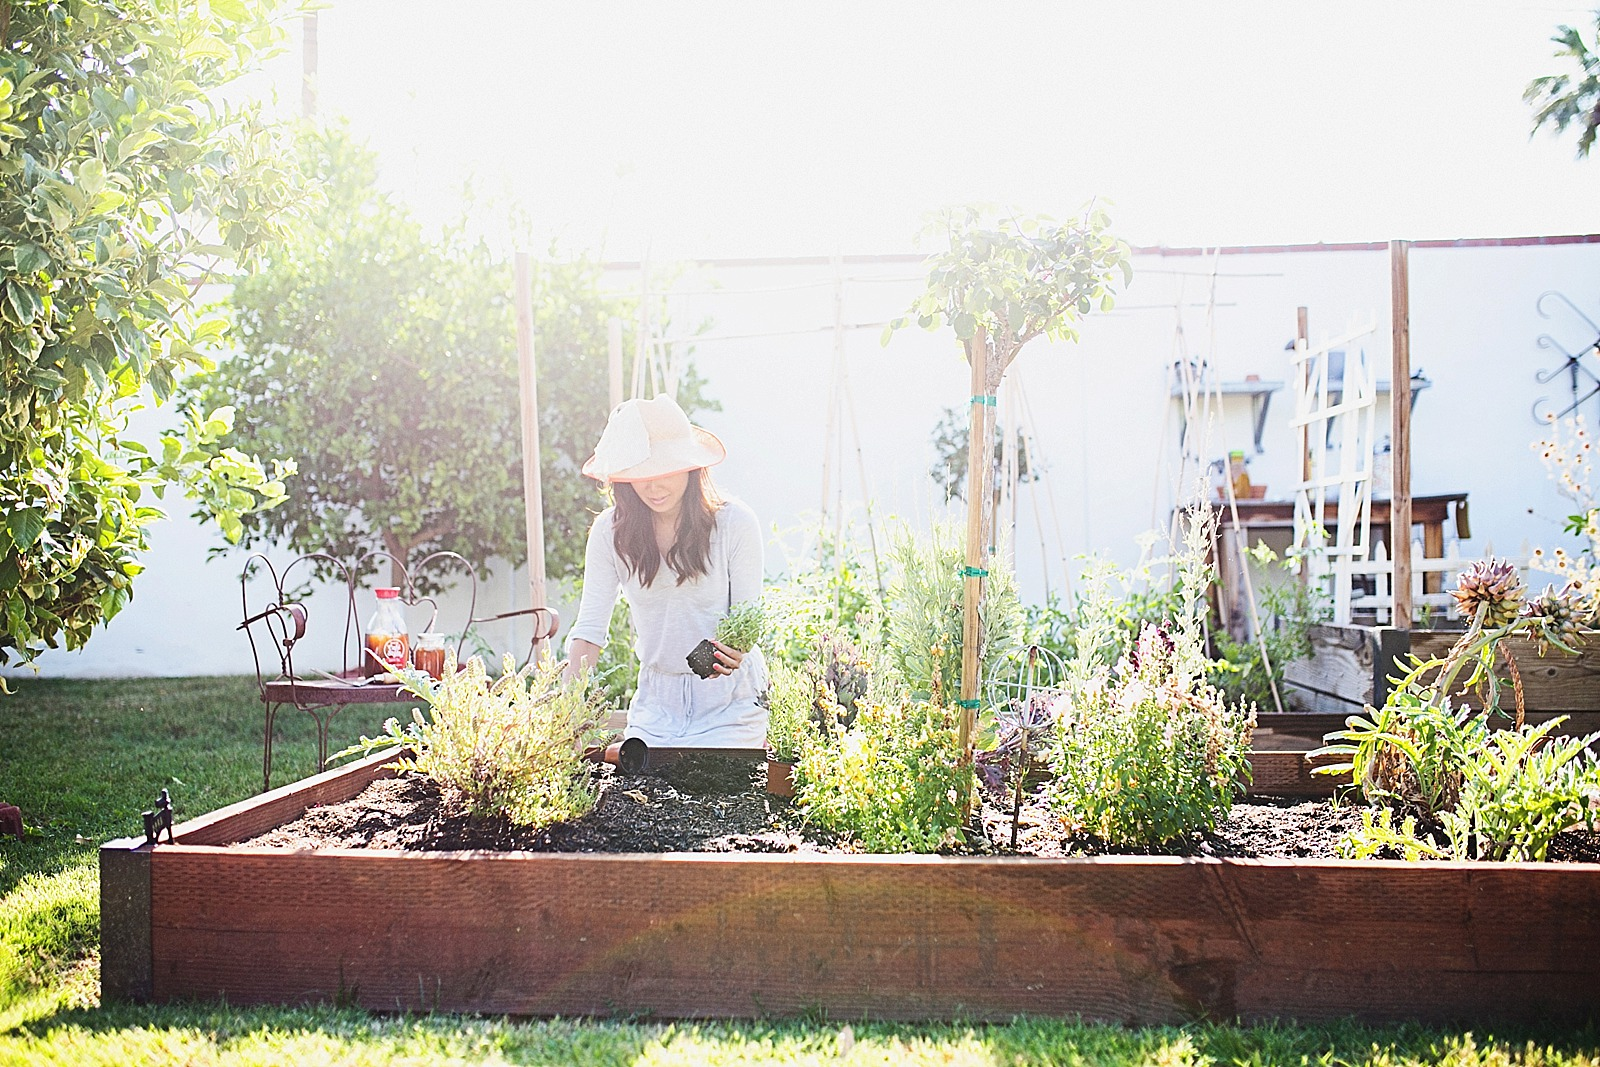 milo-iced-tea-gardening-lifestyle-blogger-diana-elizabeth-blog_0055